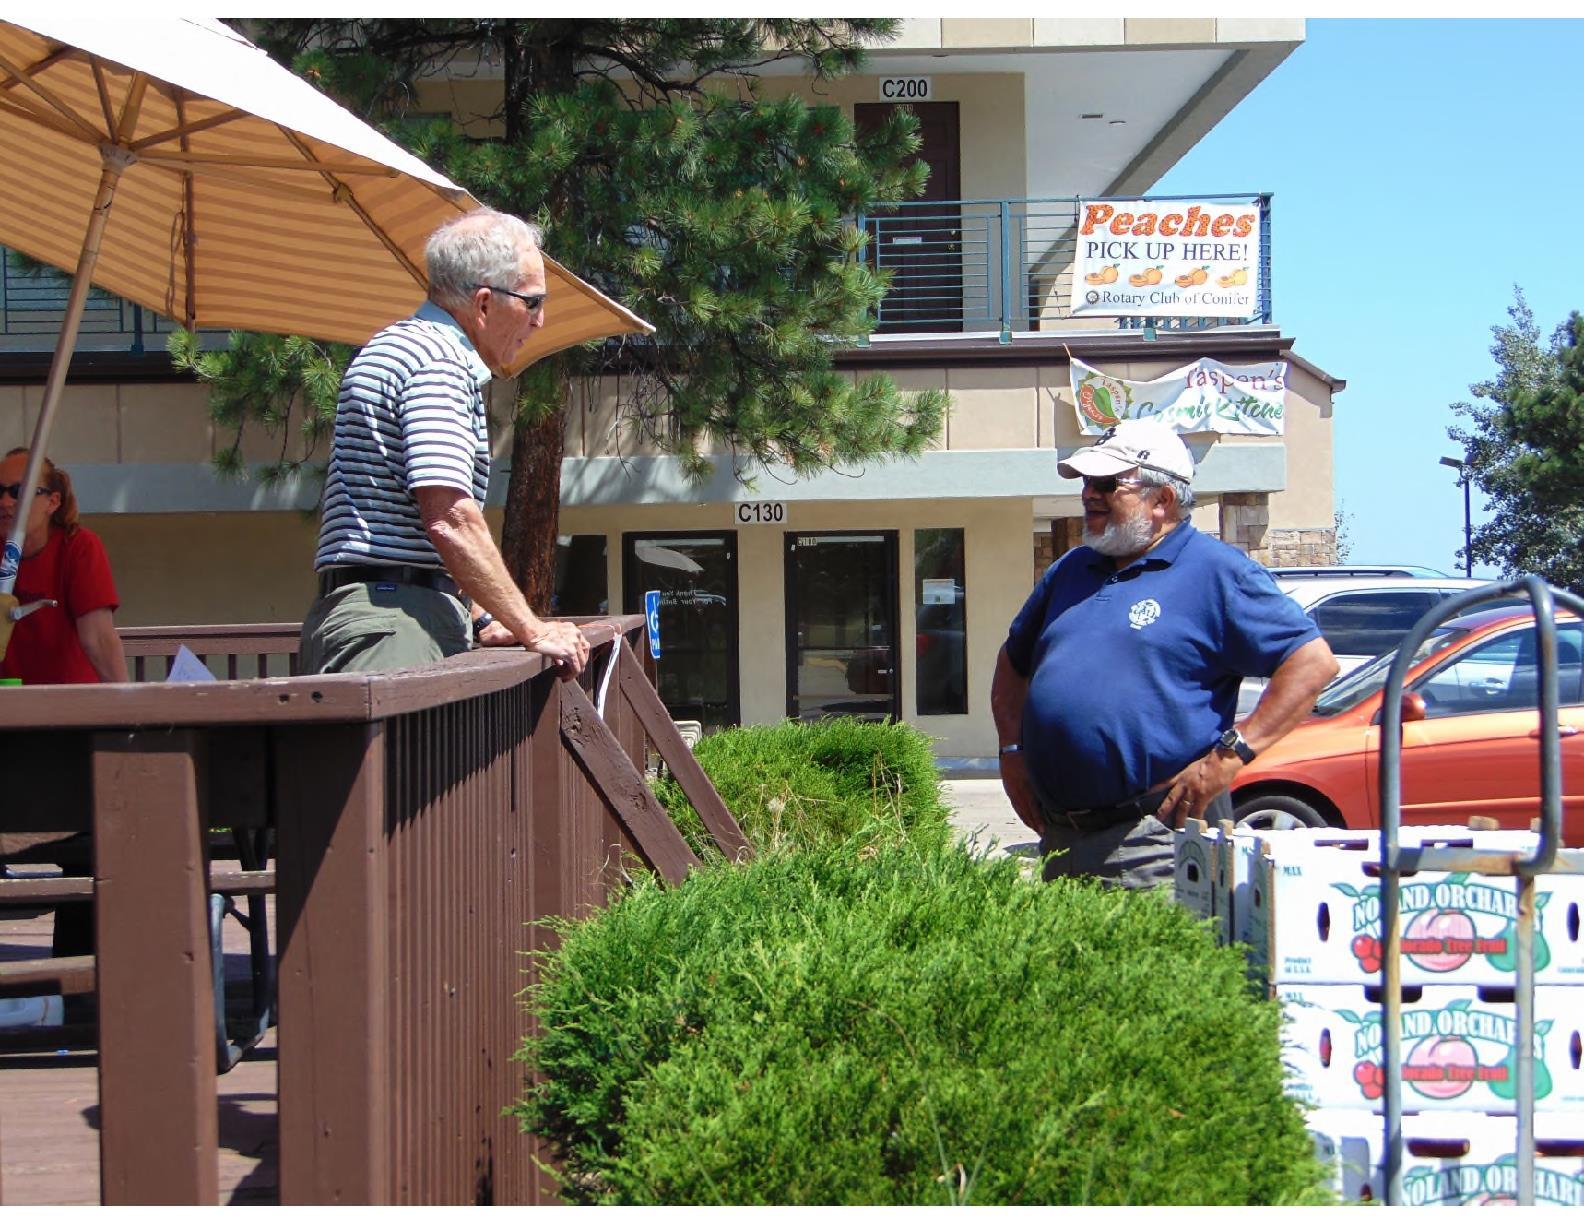 Aug 18, 2017 Peaches Sale | Rotary Club of Conifer, Colorado